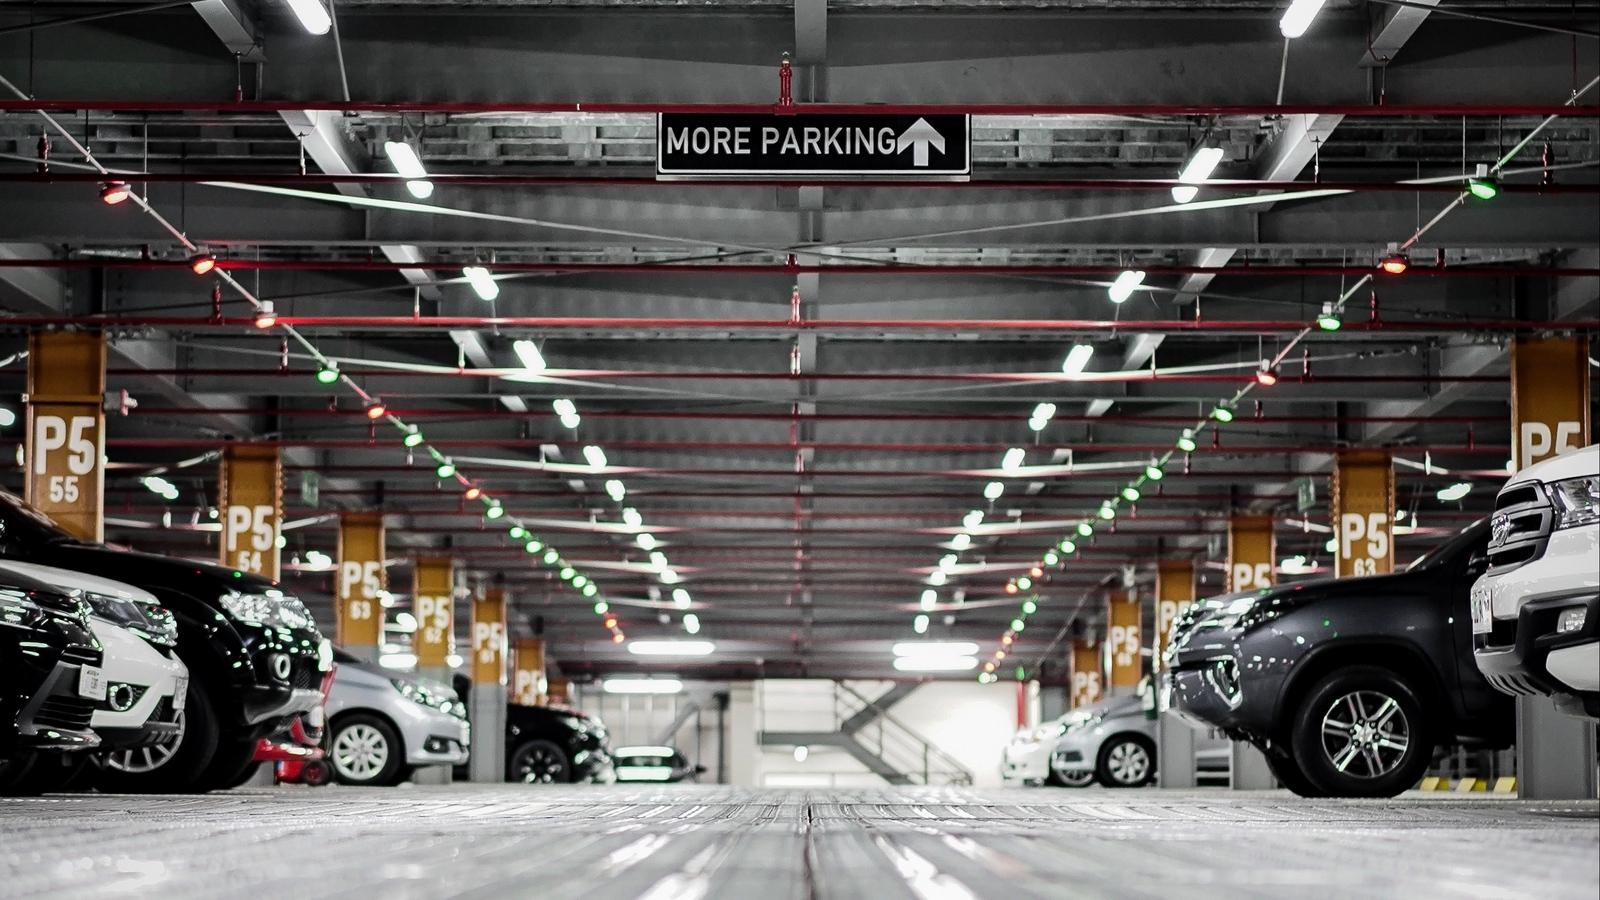 Transpark underground carpark